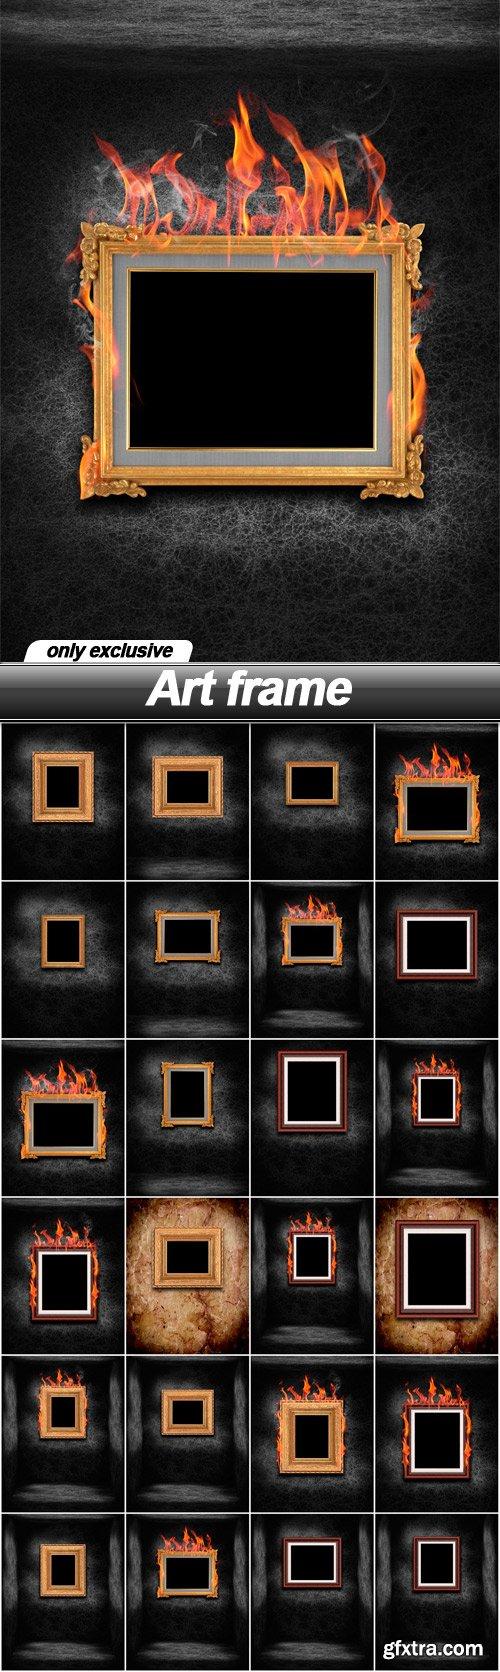 Art frame - 24 UHQ JPEG